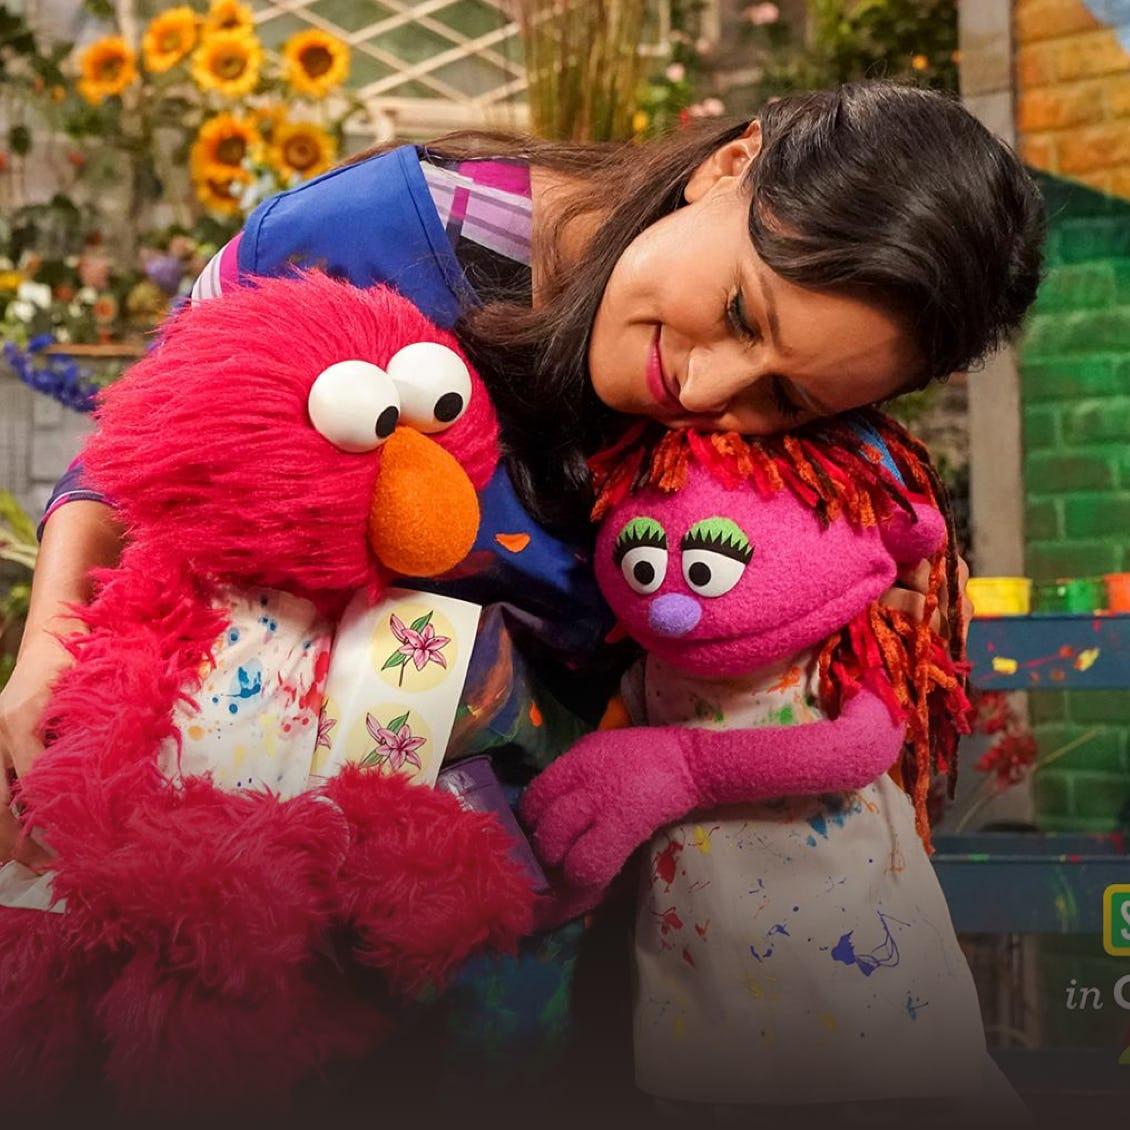 a woman huging Elmo and Abby Cadabby